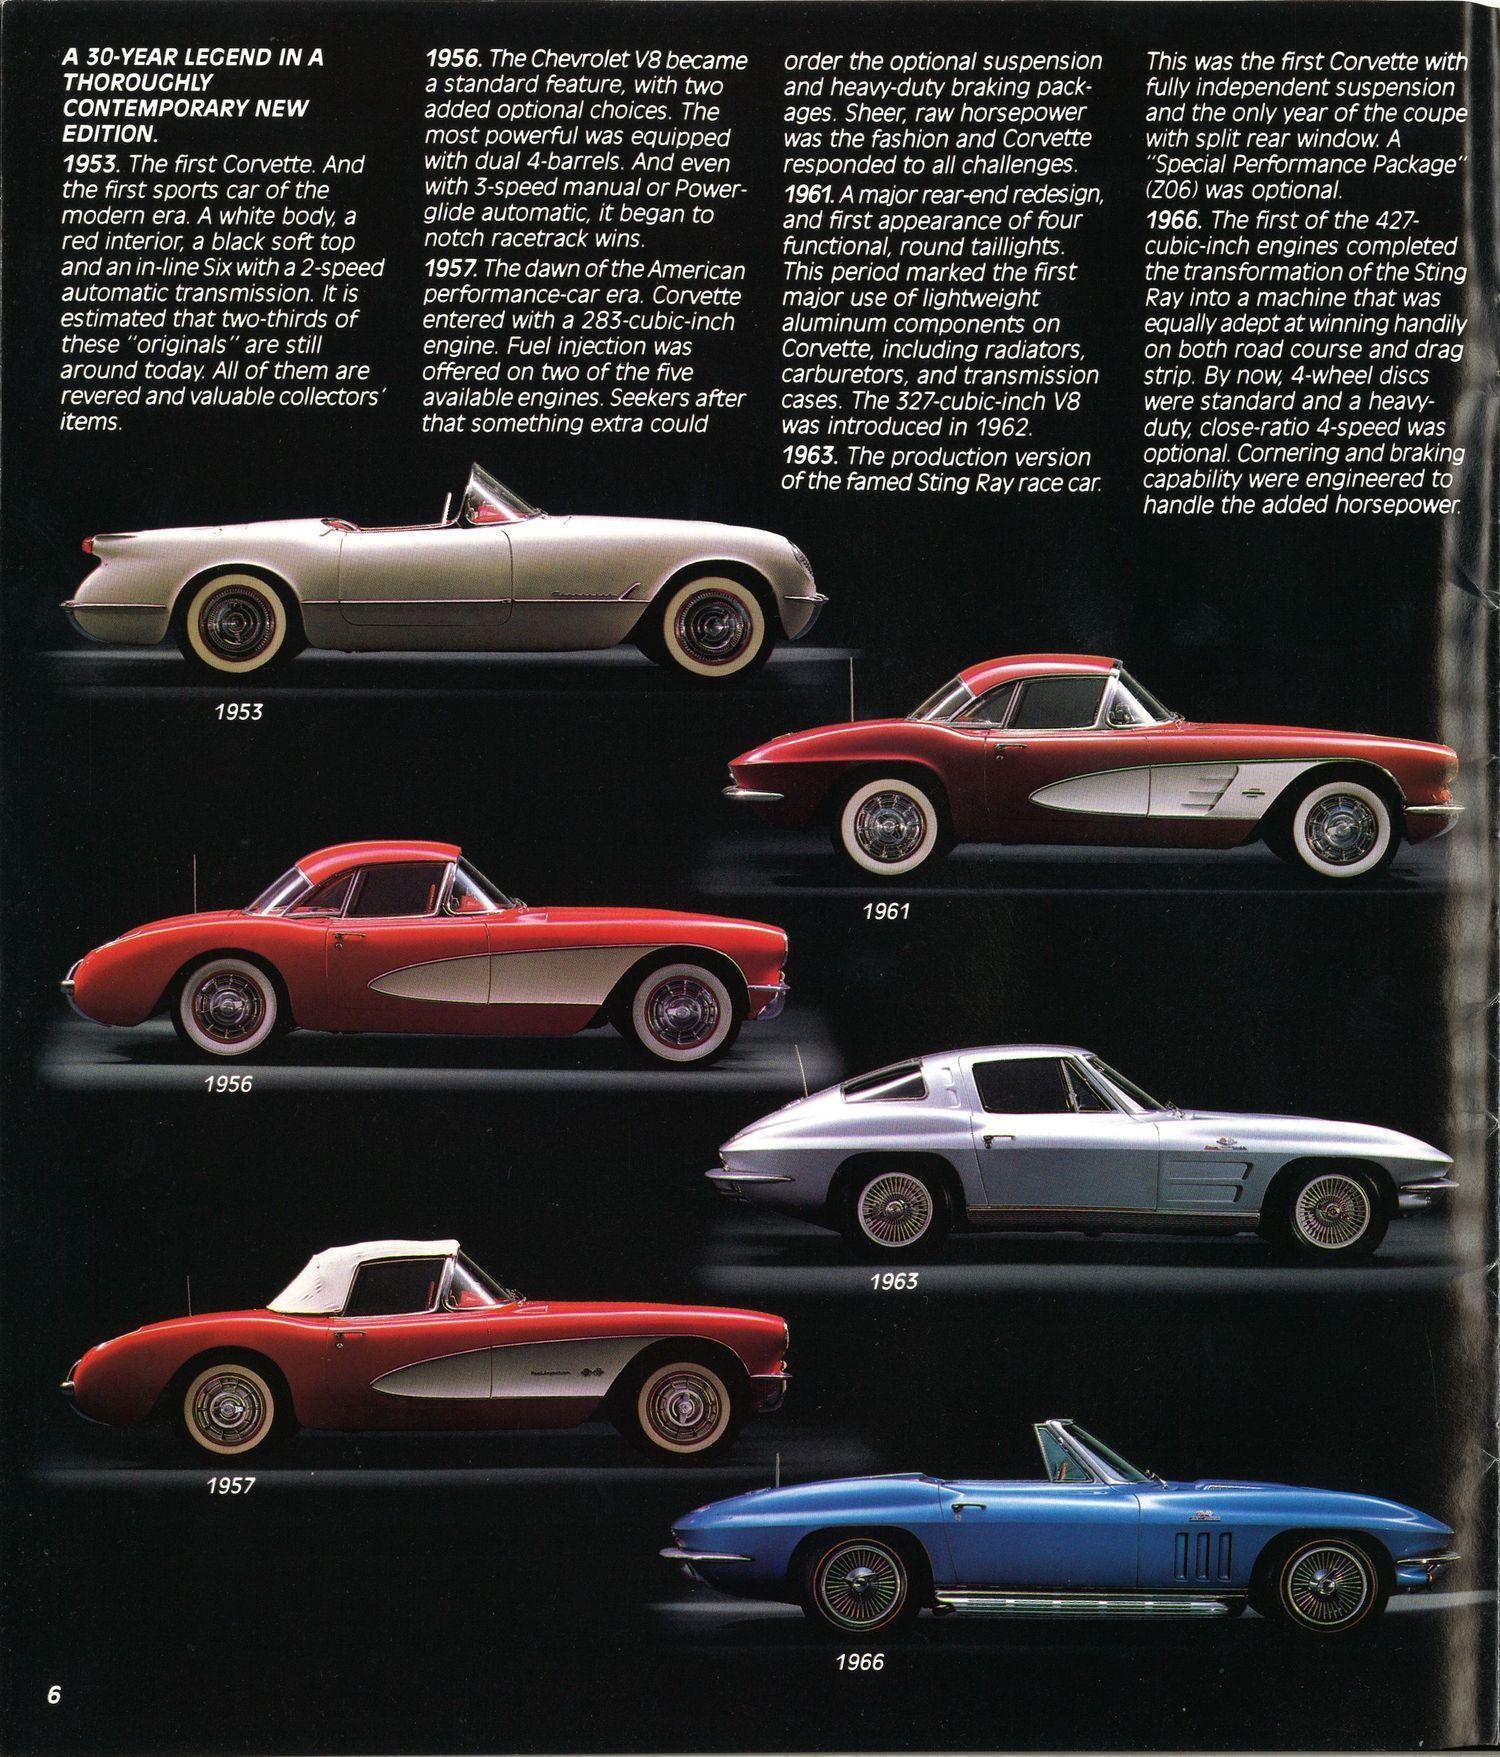 C4 Corvette Brochure Is A Blast From The Past Autoevolution